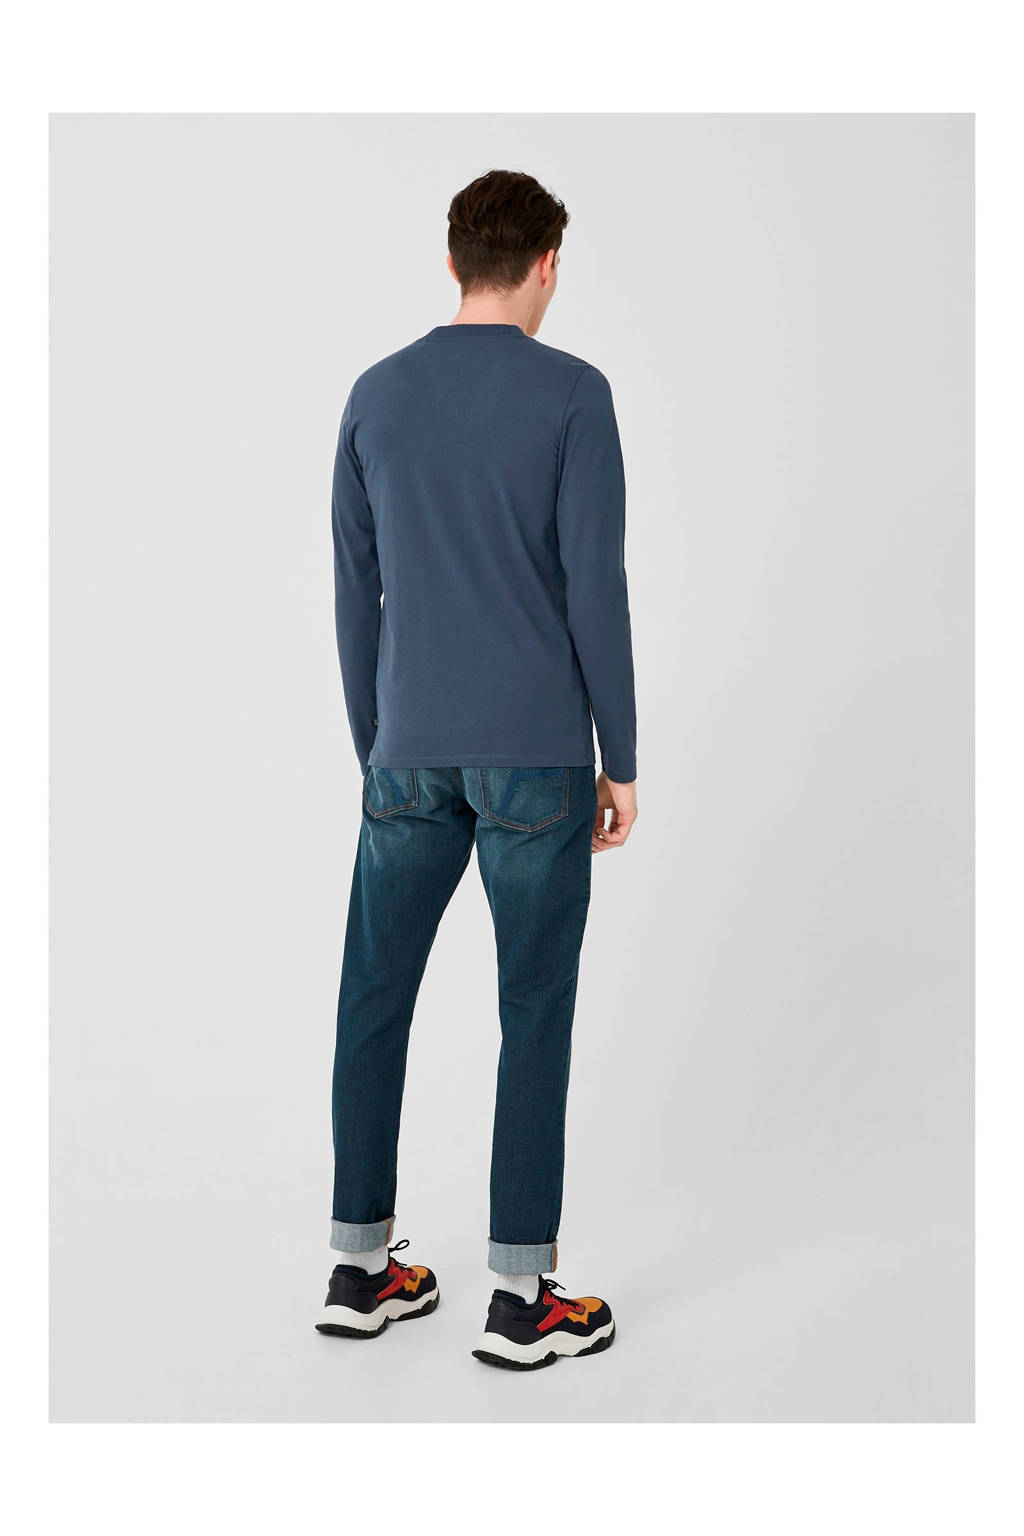 Q/S designed by T-shirt met printopdruk donkerblauw, Donkerblauw